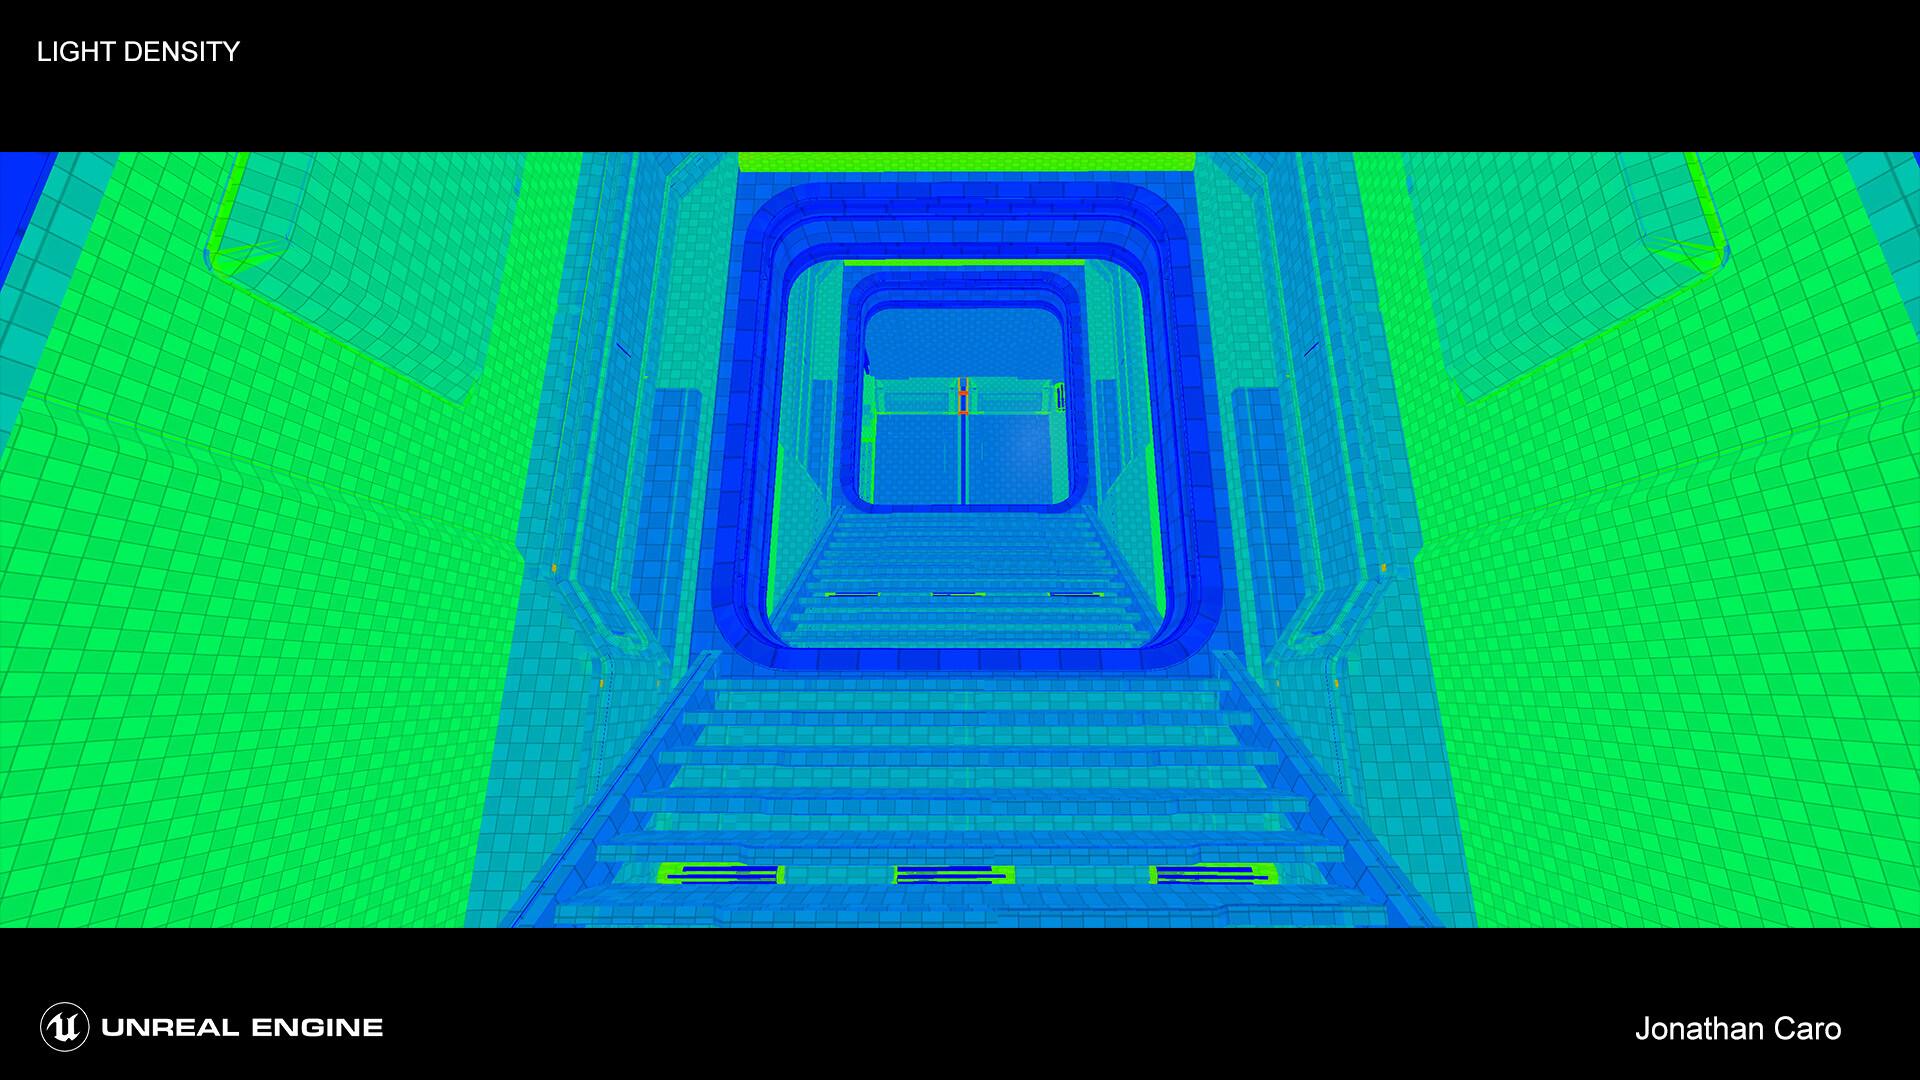 Jonathan caro joncaro unreallightstudy shot03 lightdensity